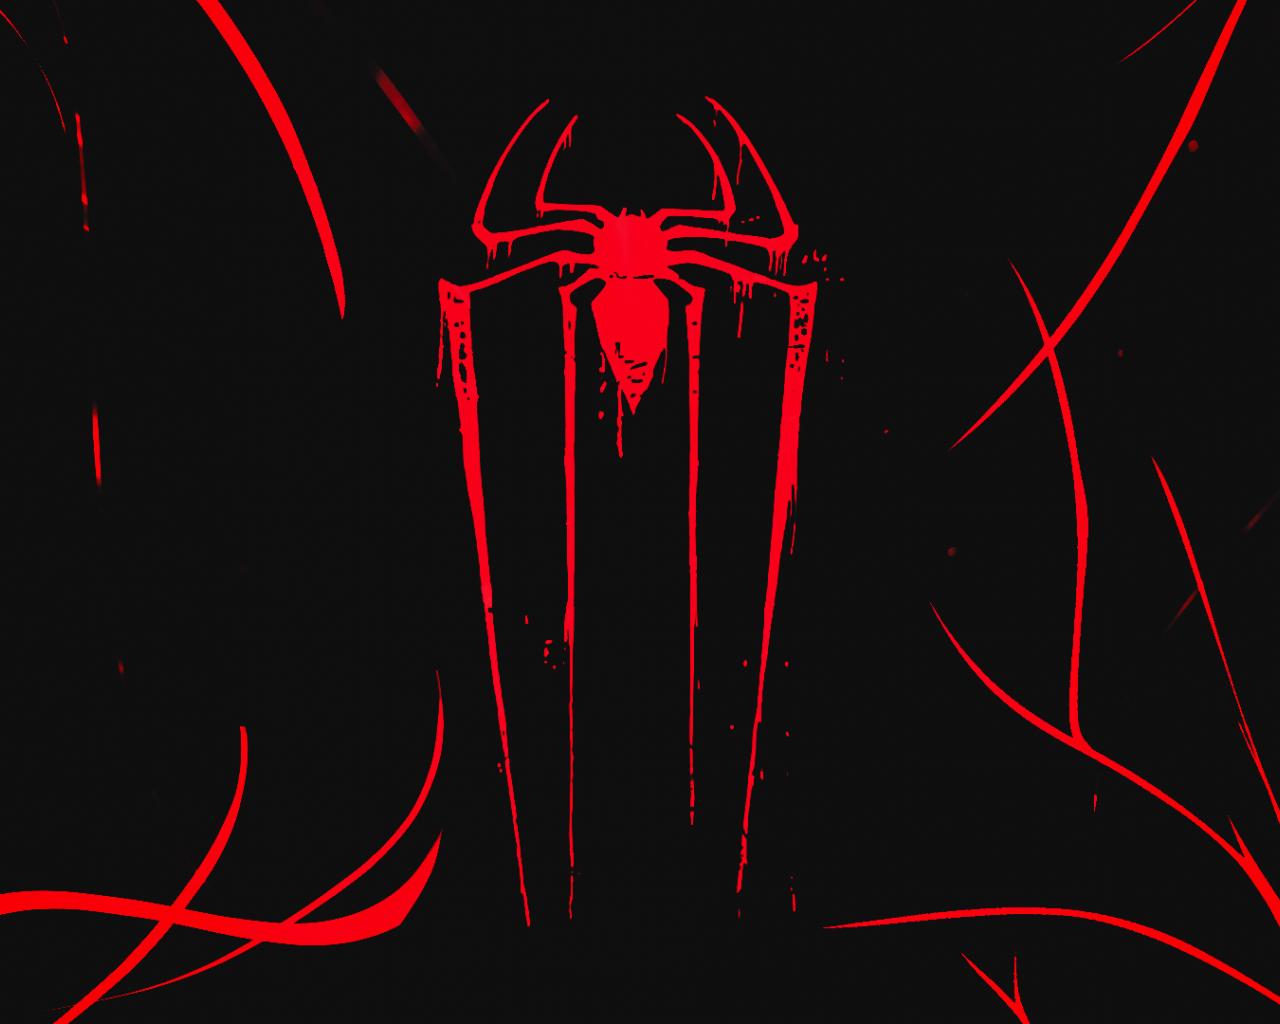 Logo, minimal, spider-man, dark, 1280x1024 wallpaper